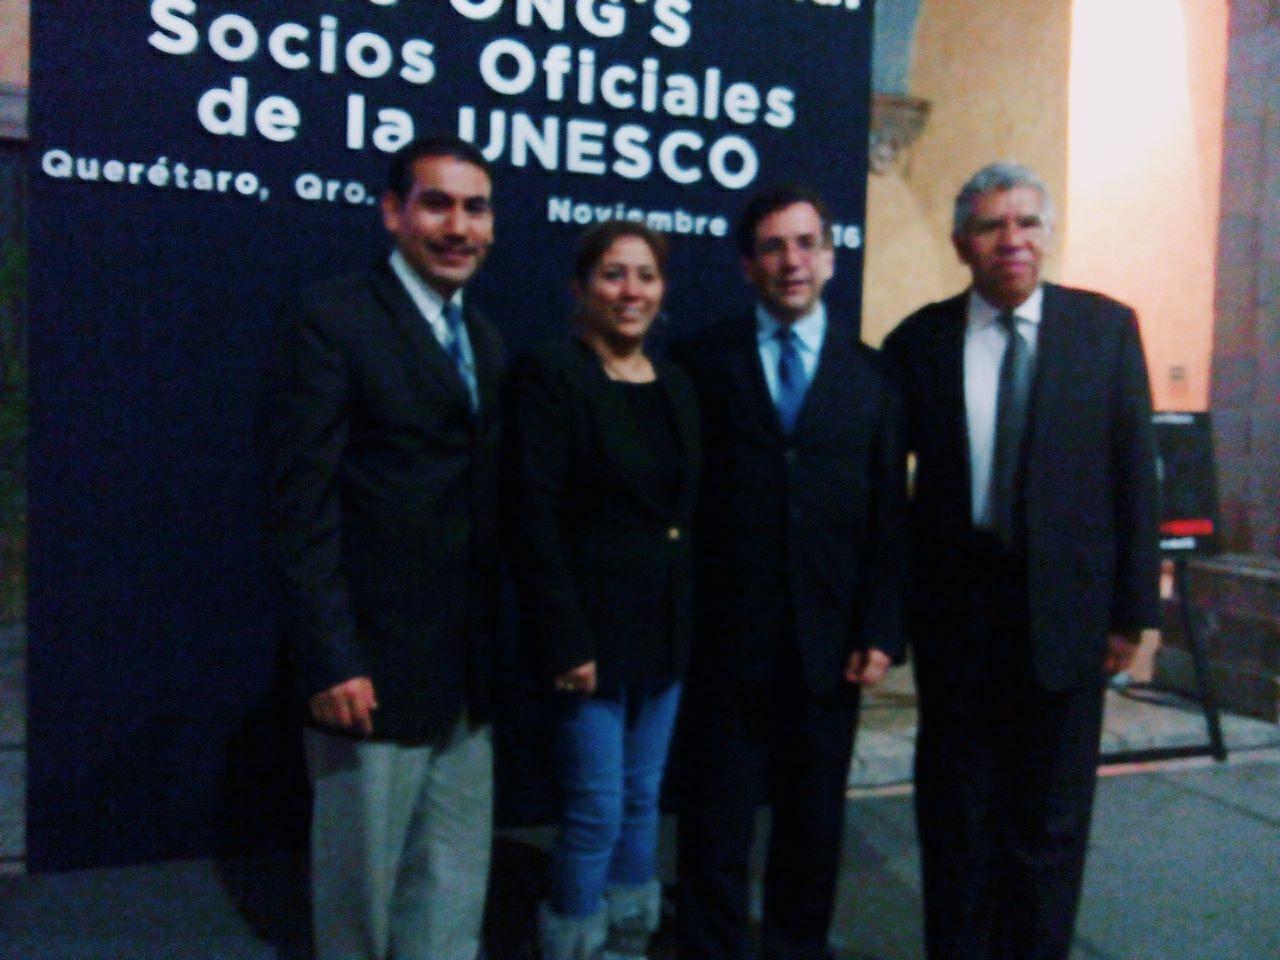 6o_Foro_Internacional_de_las_ONGs_Socios_Oficiales_de_la_UNESCO,_Querétaro,_cena_de_despedida